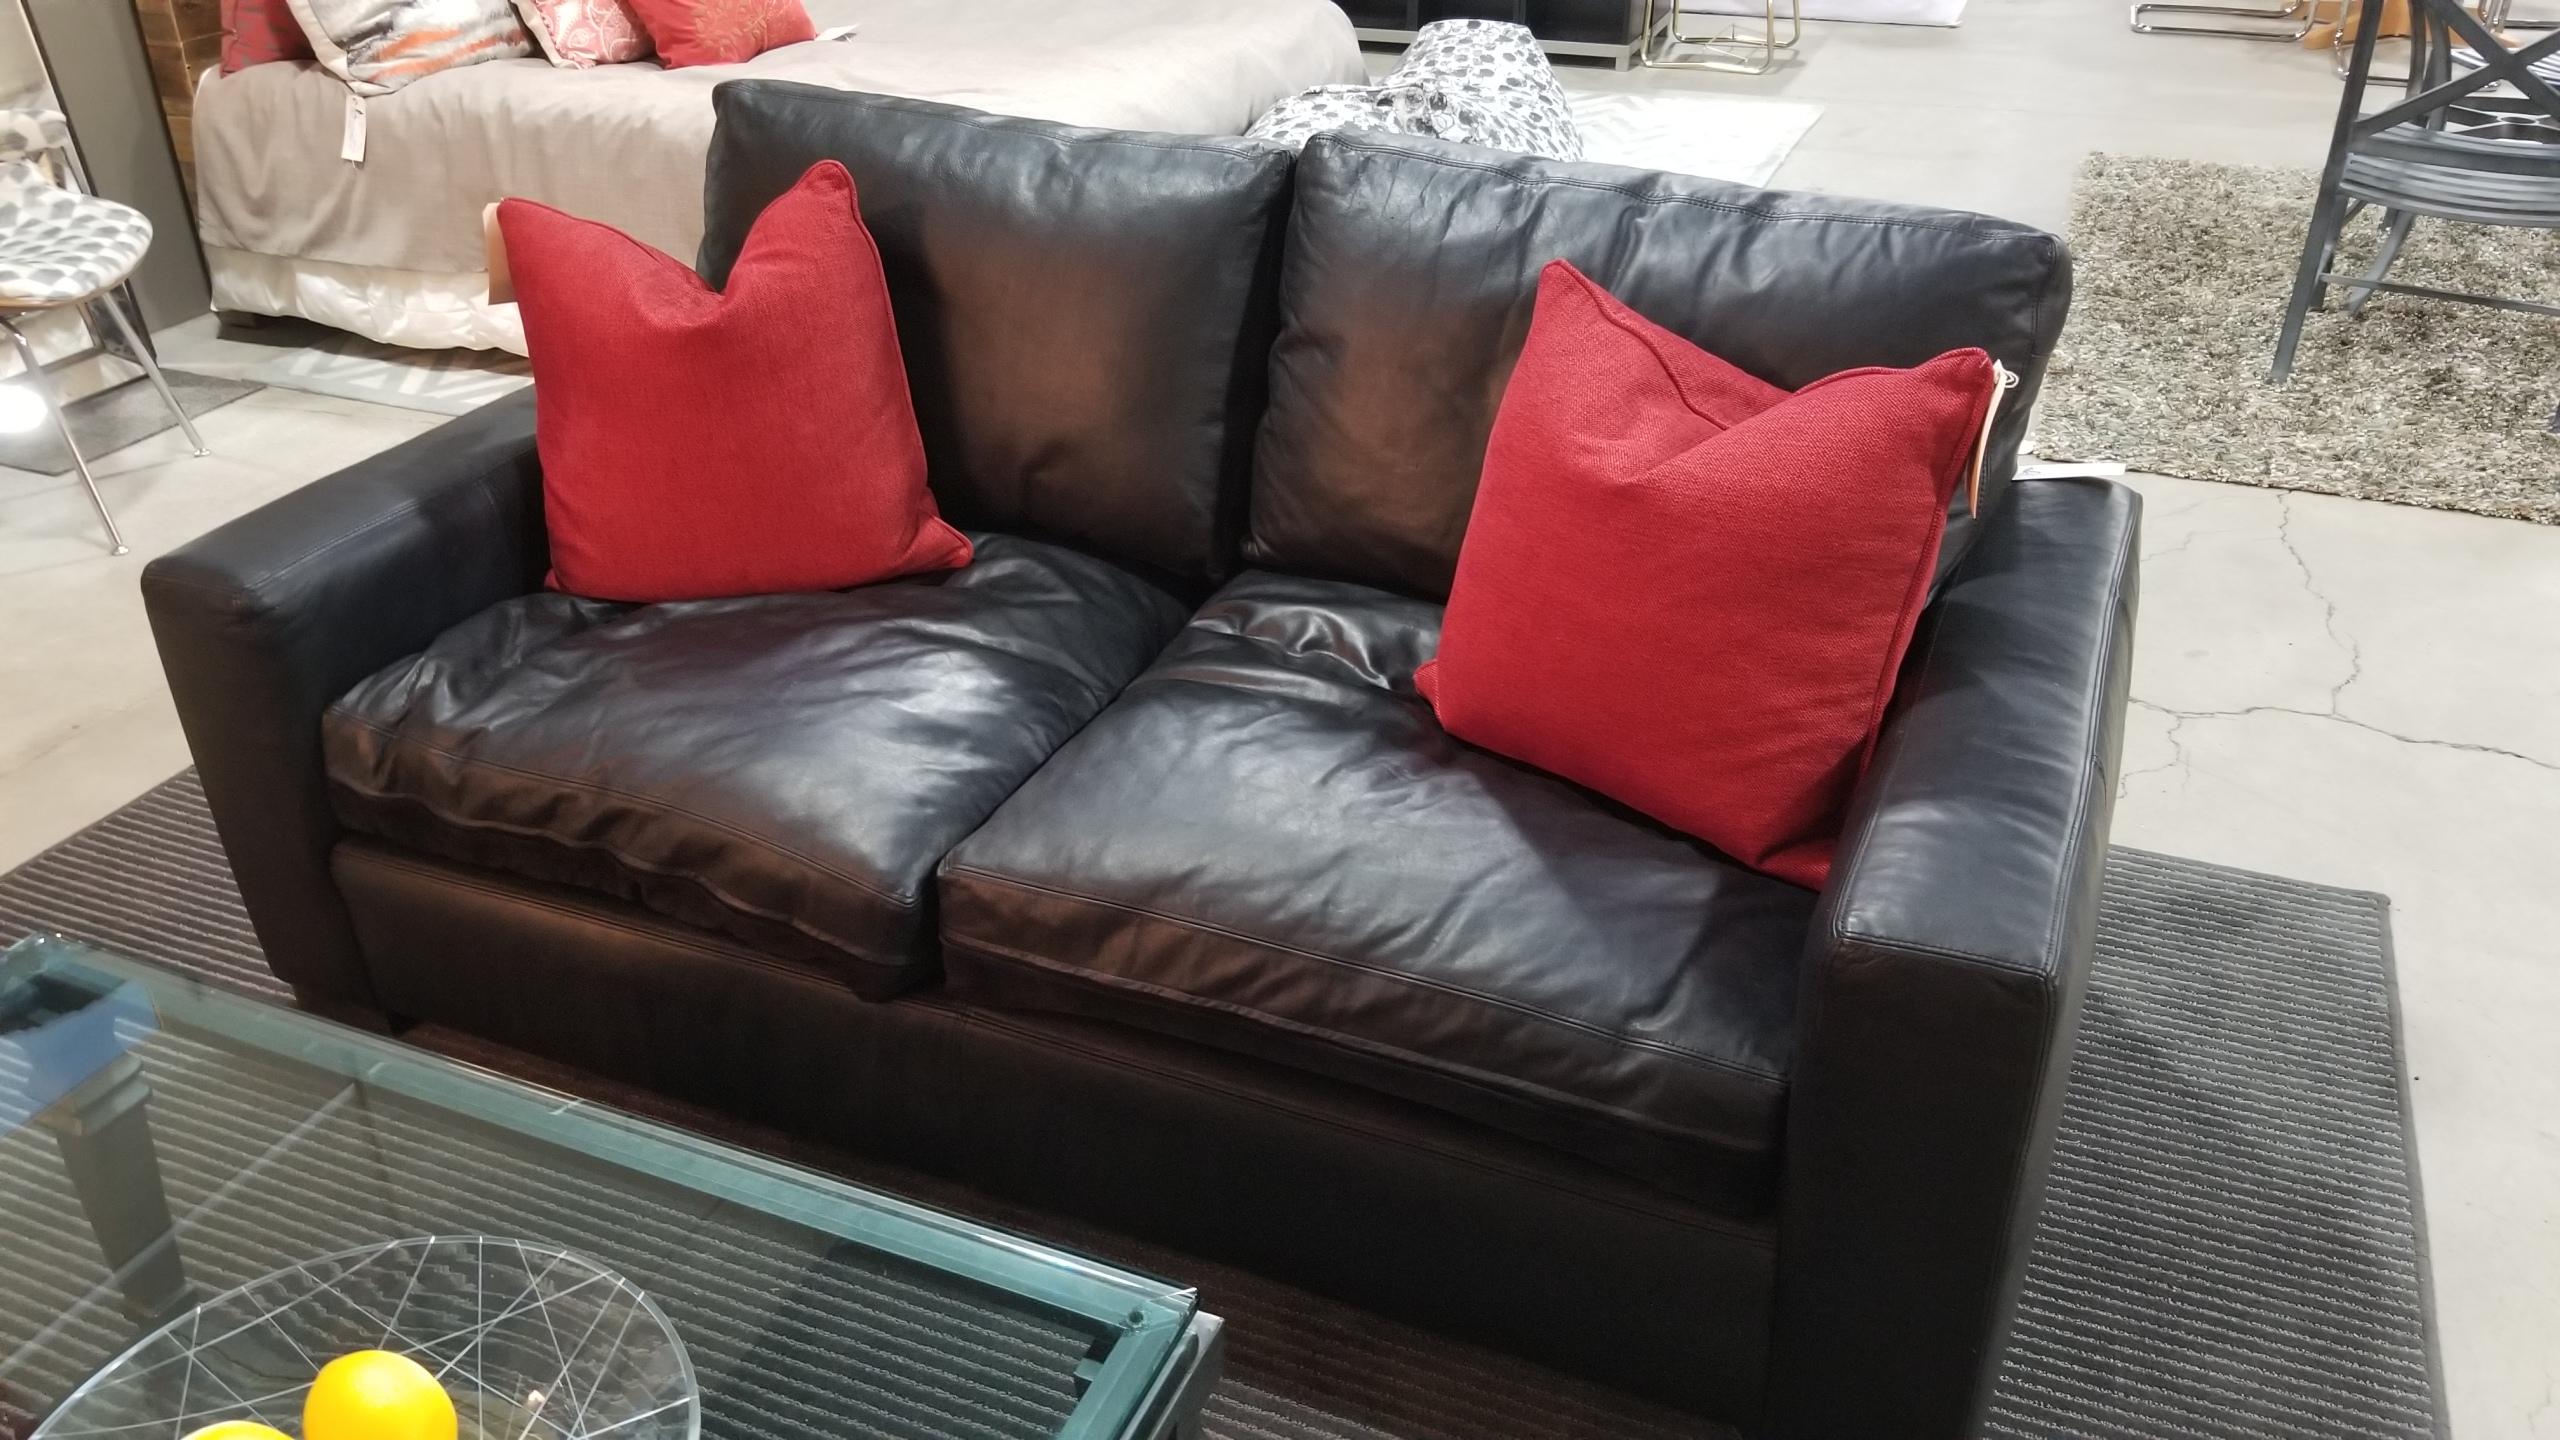 Restoration Hardware U2013 U0027Maxwellu0027 Sofa U2013 Ebony Italian Berkshire Leather U2013  Down Filled U2013 SOLD Measures 72u2033w X 40u2033h X 29 1/2u2033h, Retails For $3321, ...